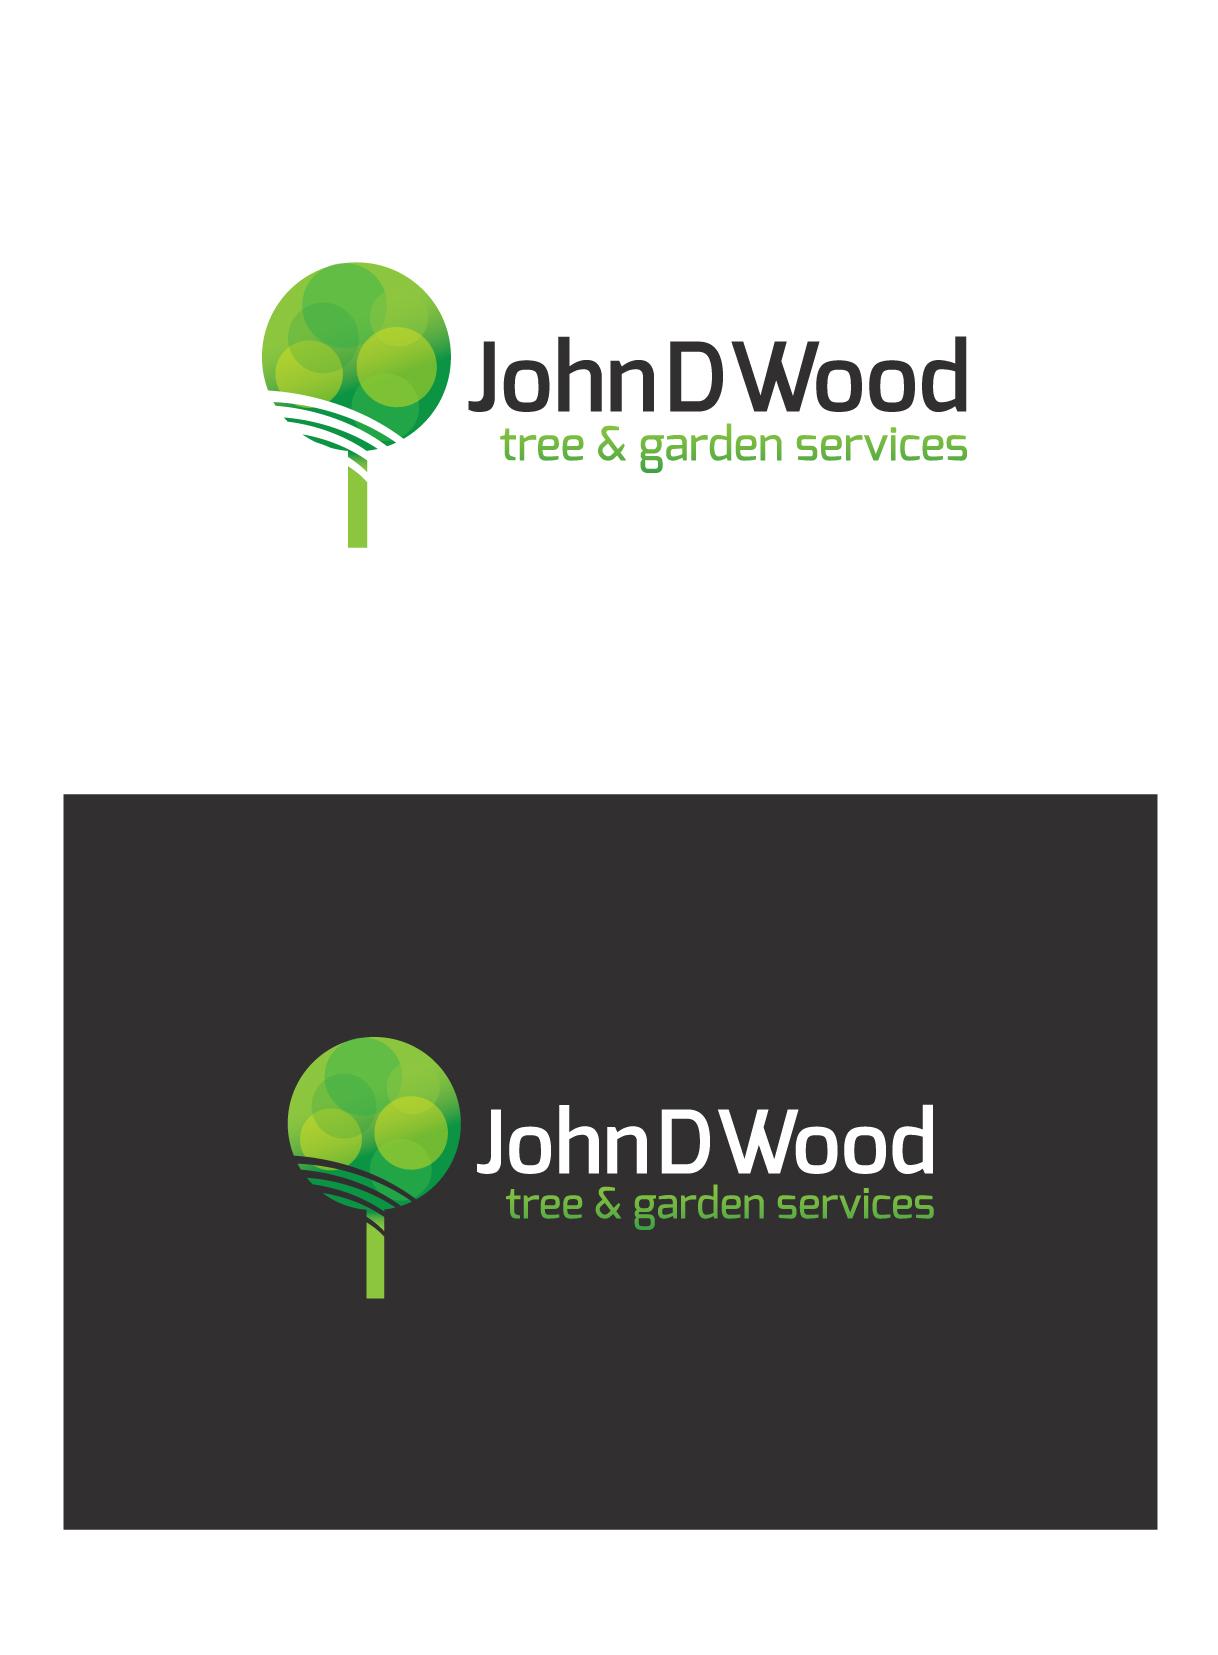 bold serious logo design for john d wood tree garden services